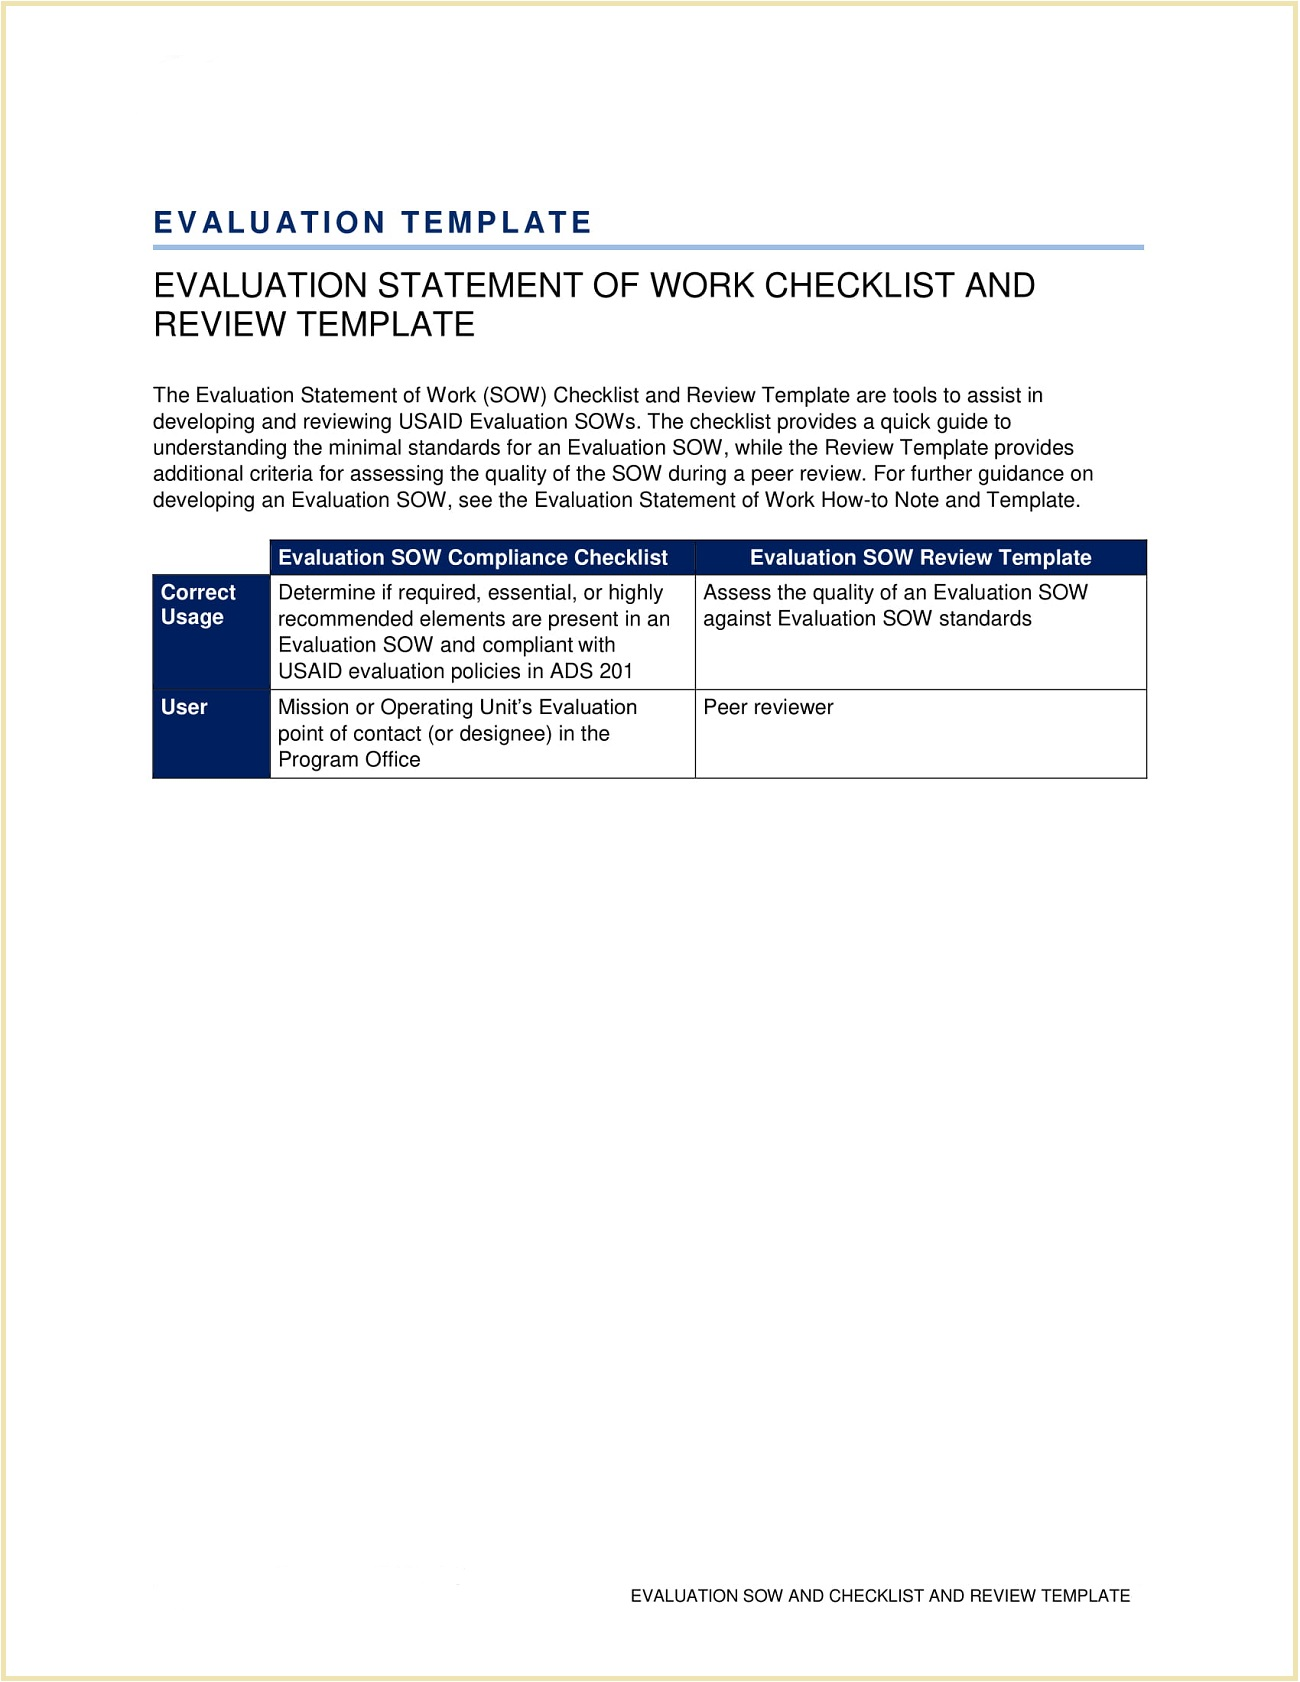 Evaluation Statement of Work Checklist Template PDF